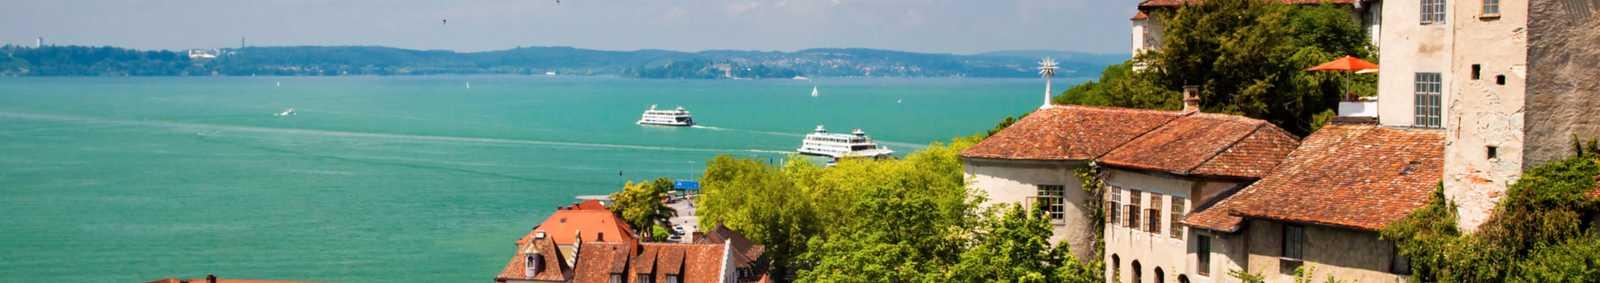 Lake Constance, Austria